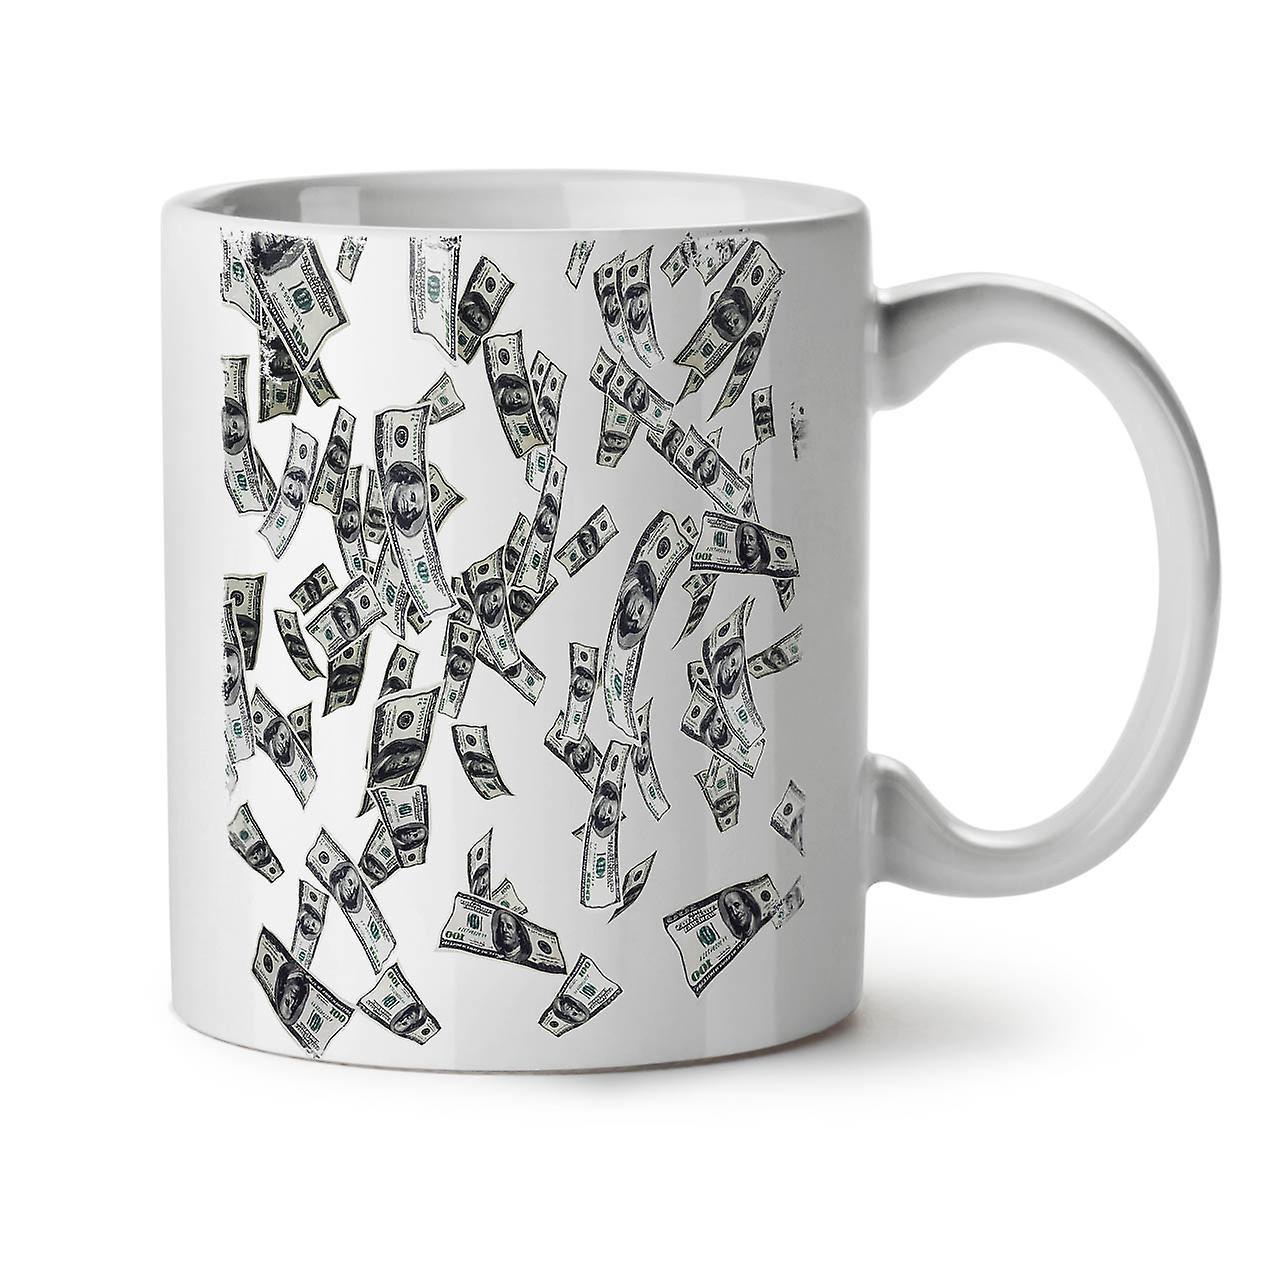 Tasse Blanc Céramique Dollar Thé Café Nouveau OzWellcoda Cash Argent 11 WIbDH9Ee2Y